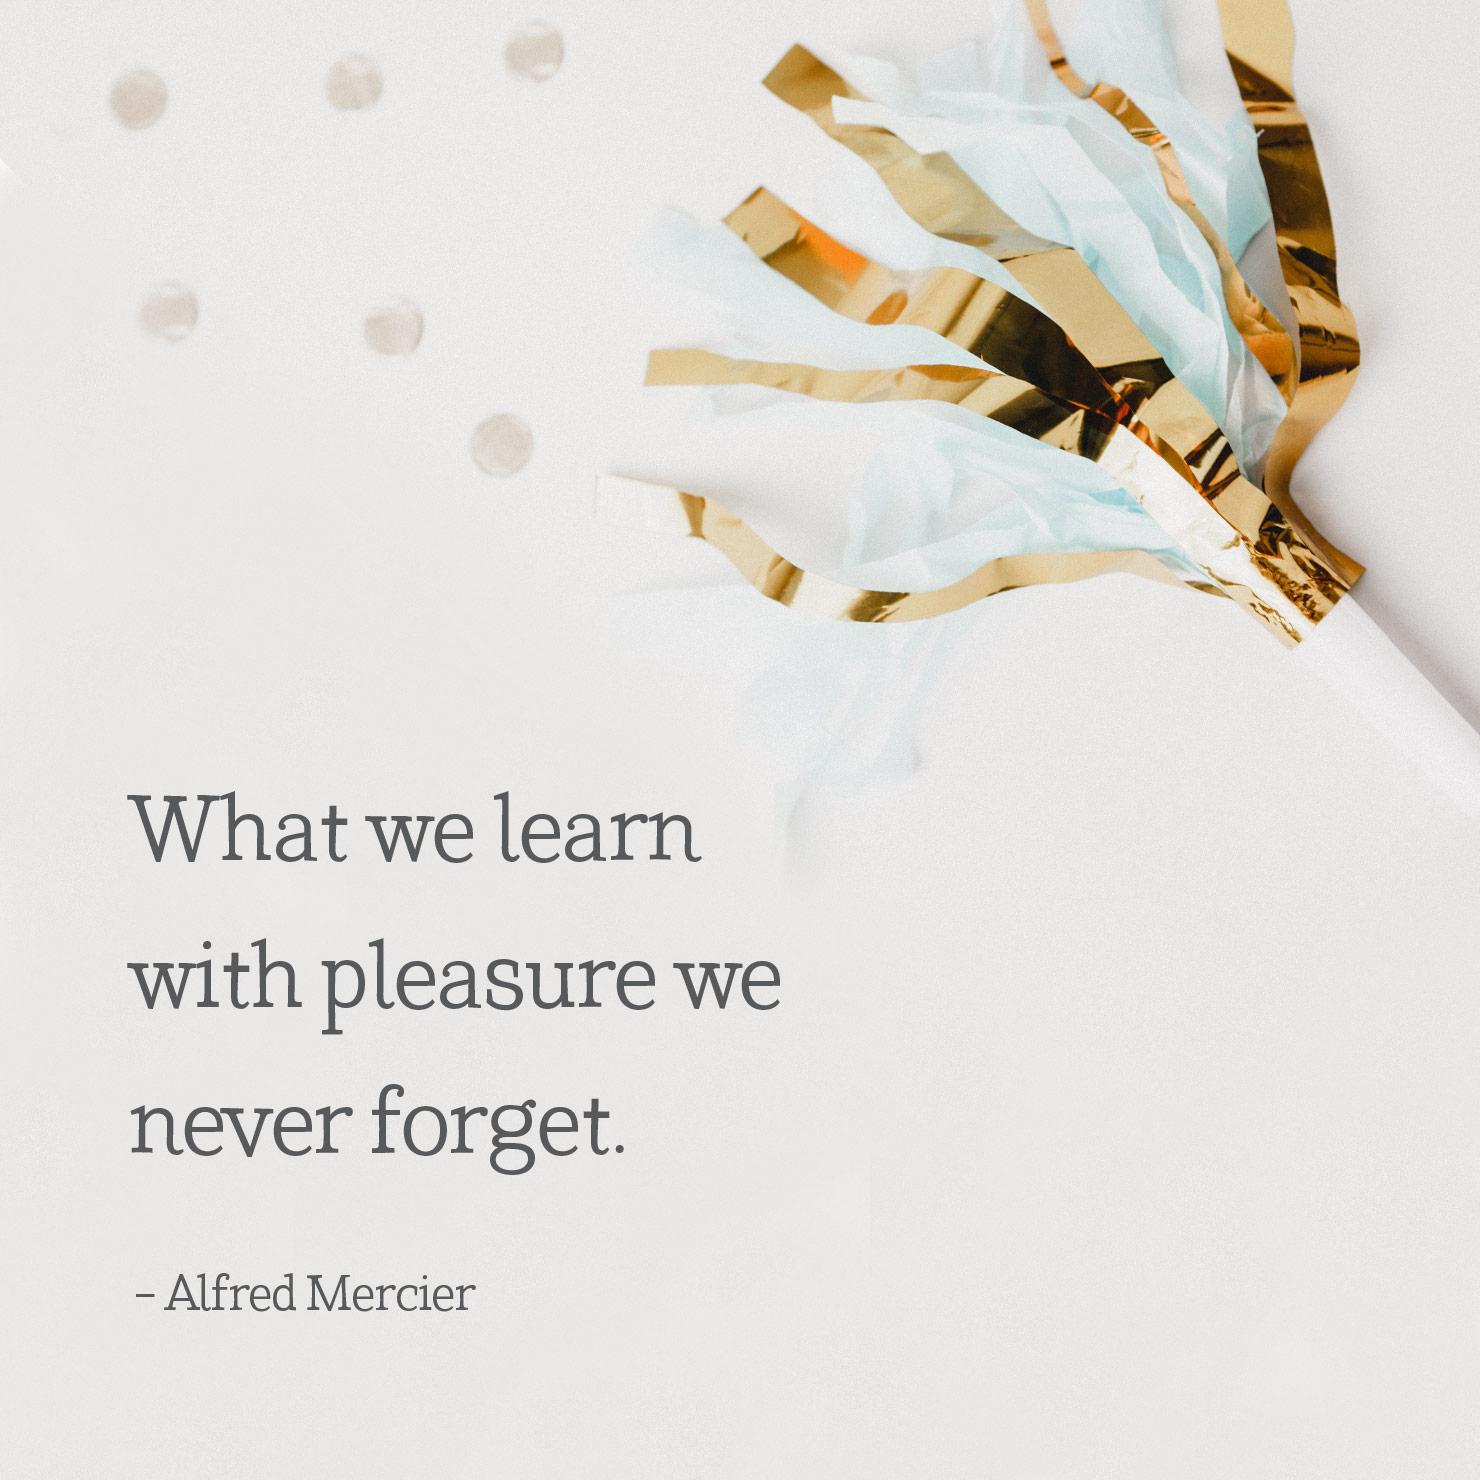 - Alfred Mercier